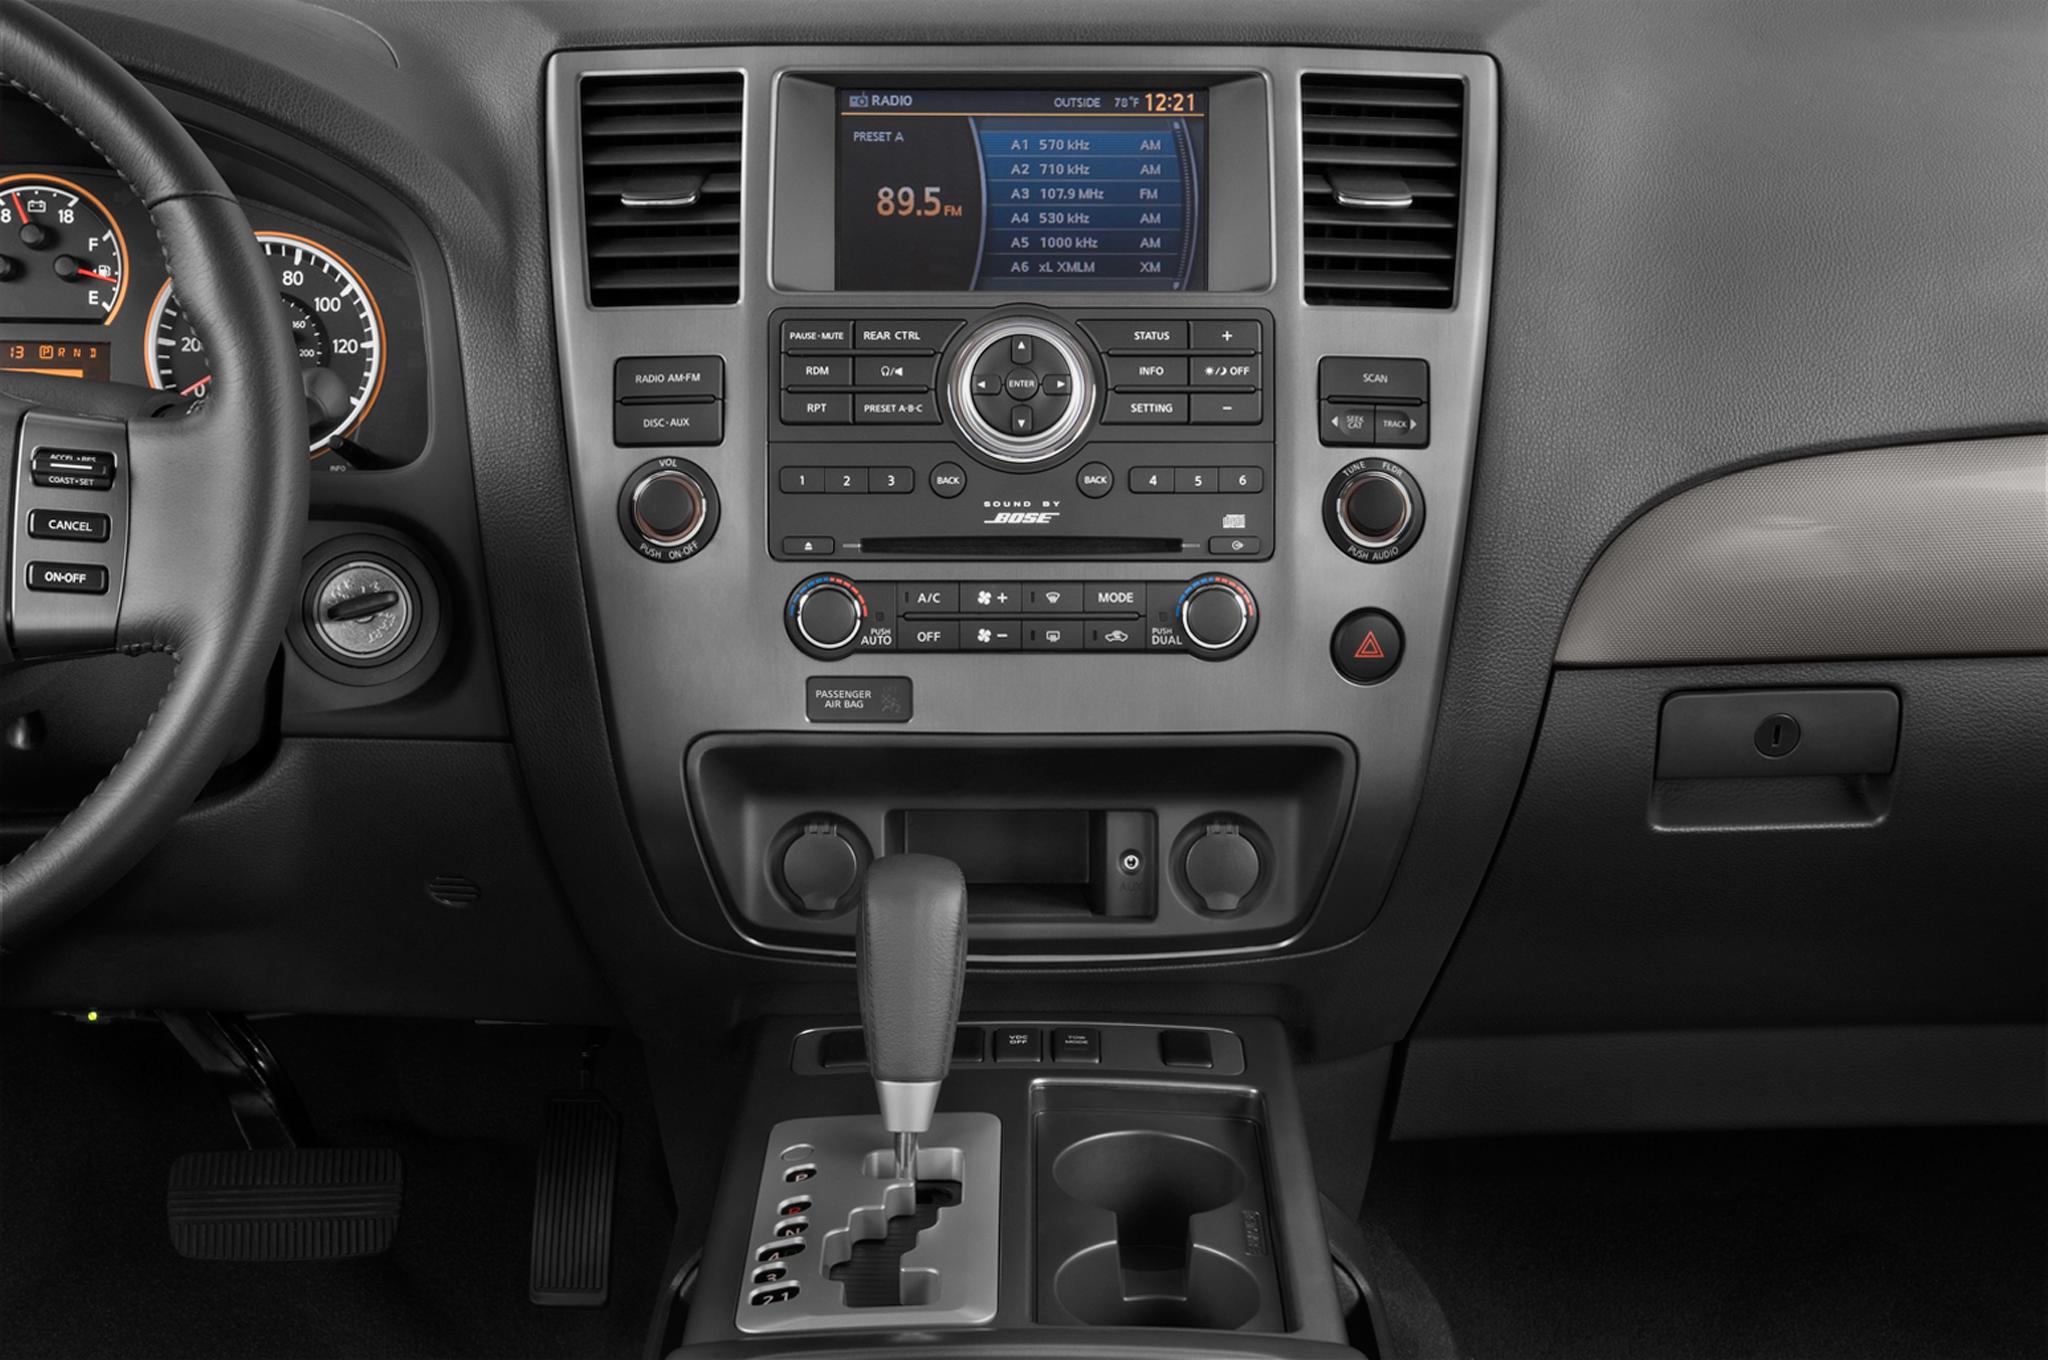 2012 Nissan Armada Platinum - Editors' Notebook ...